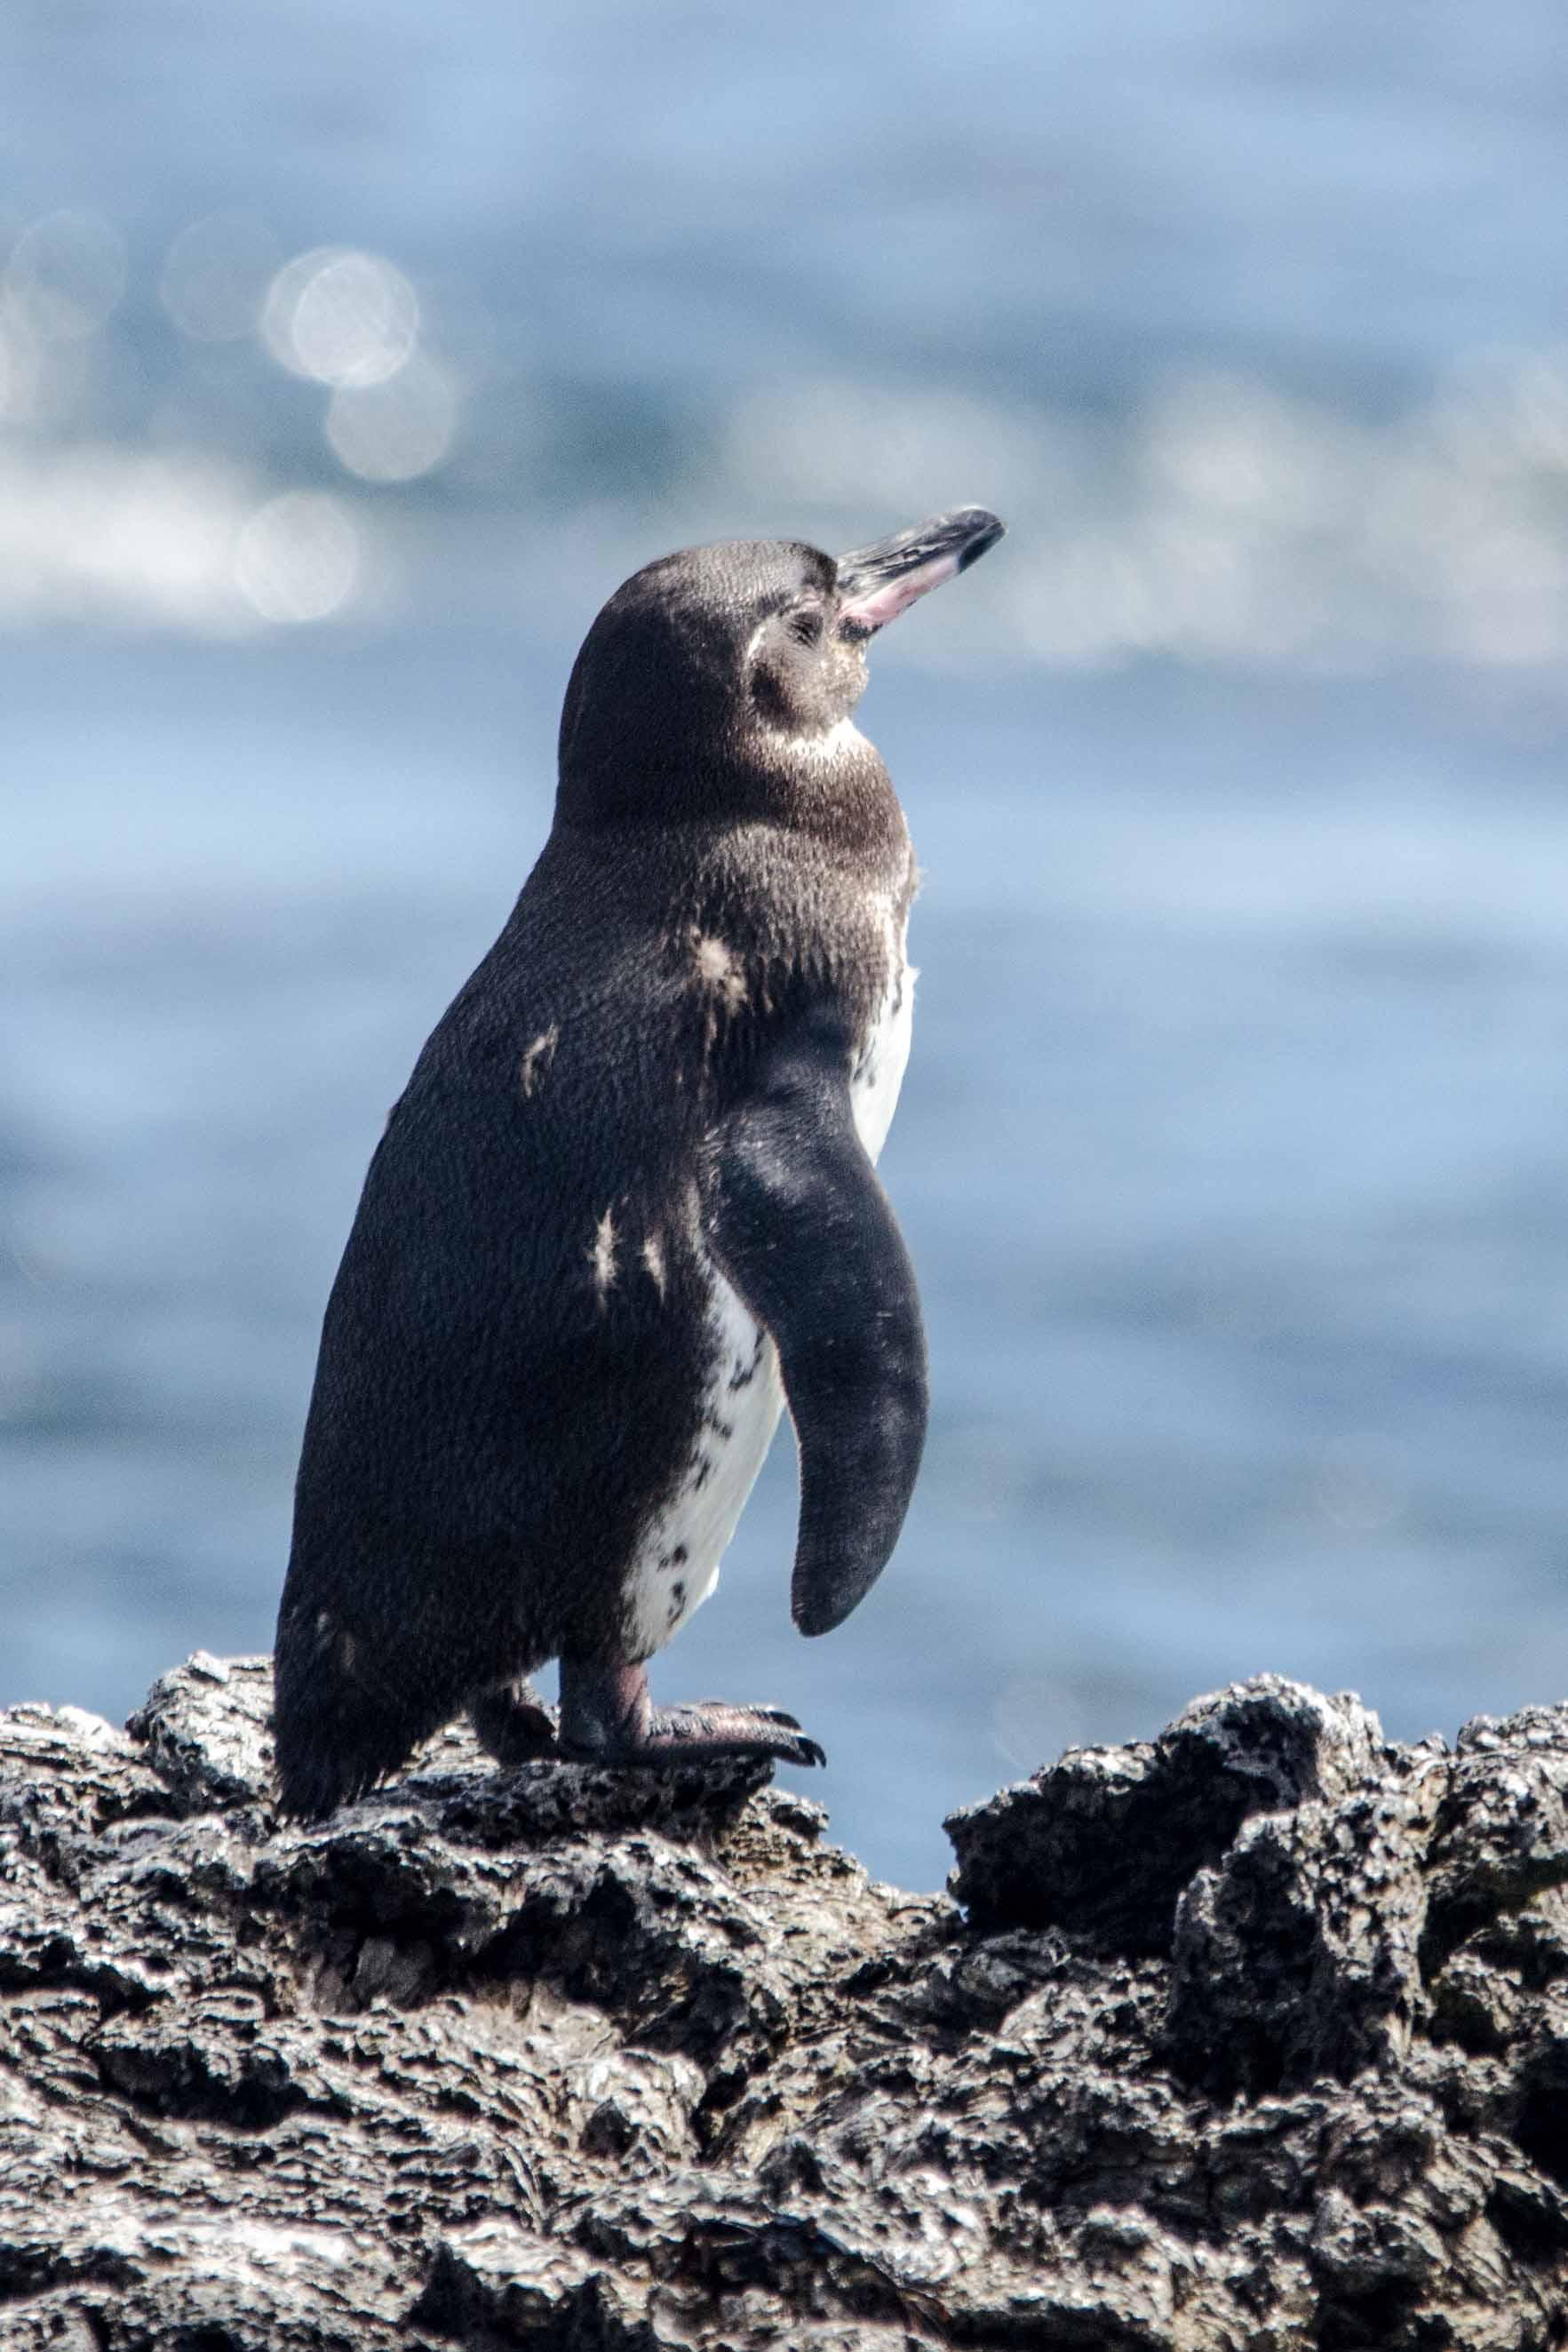 Galapagos Penguin, Isabela Island, The Galapagos, Ecuador   ©Angela Drake / Not Your Average American